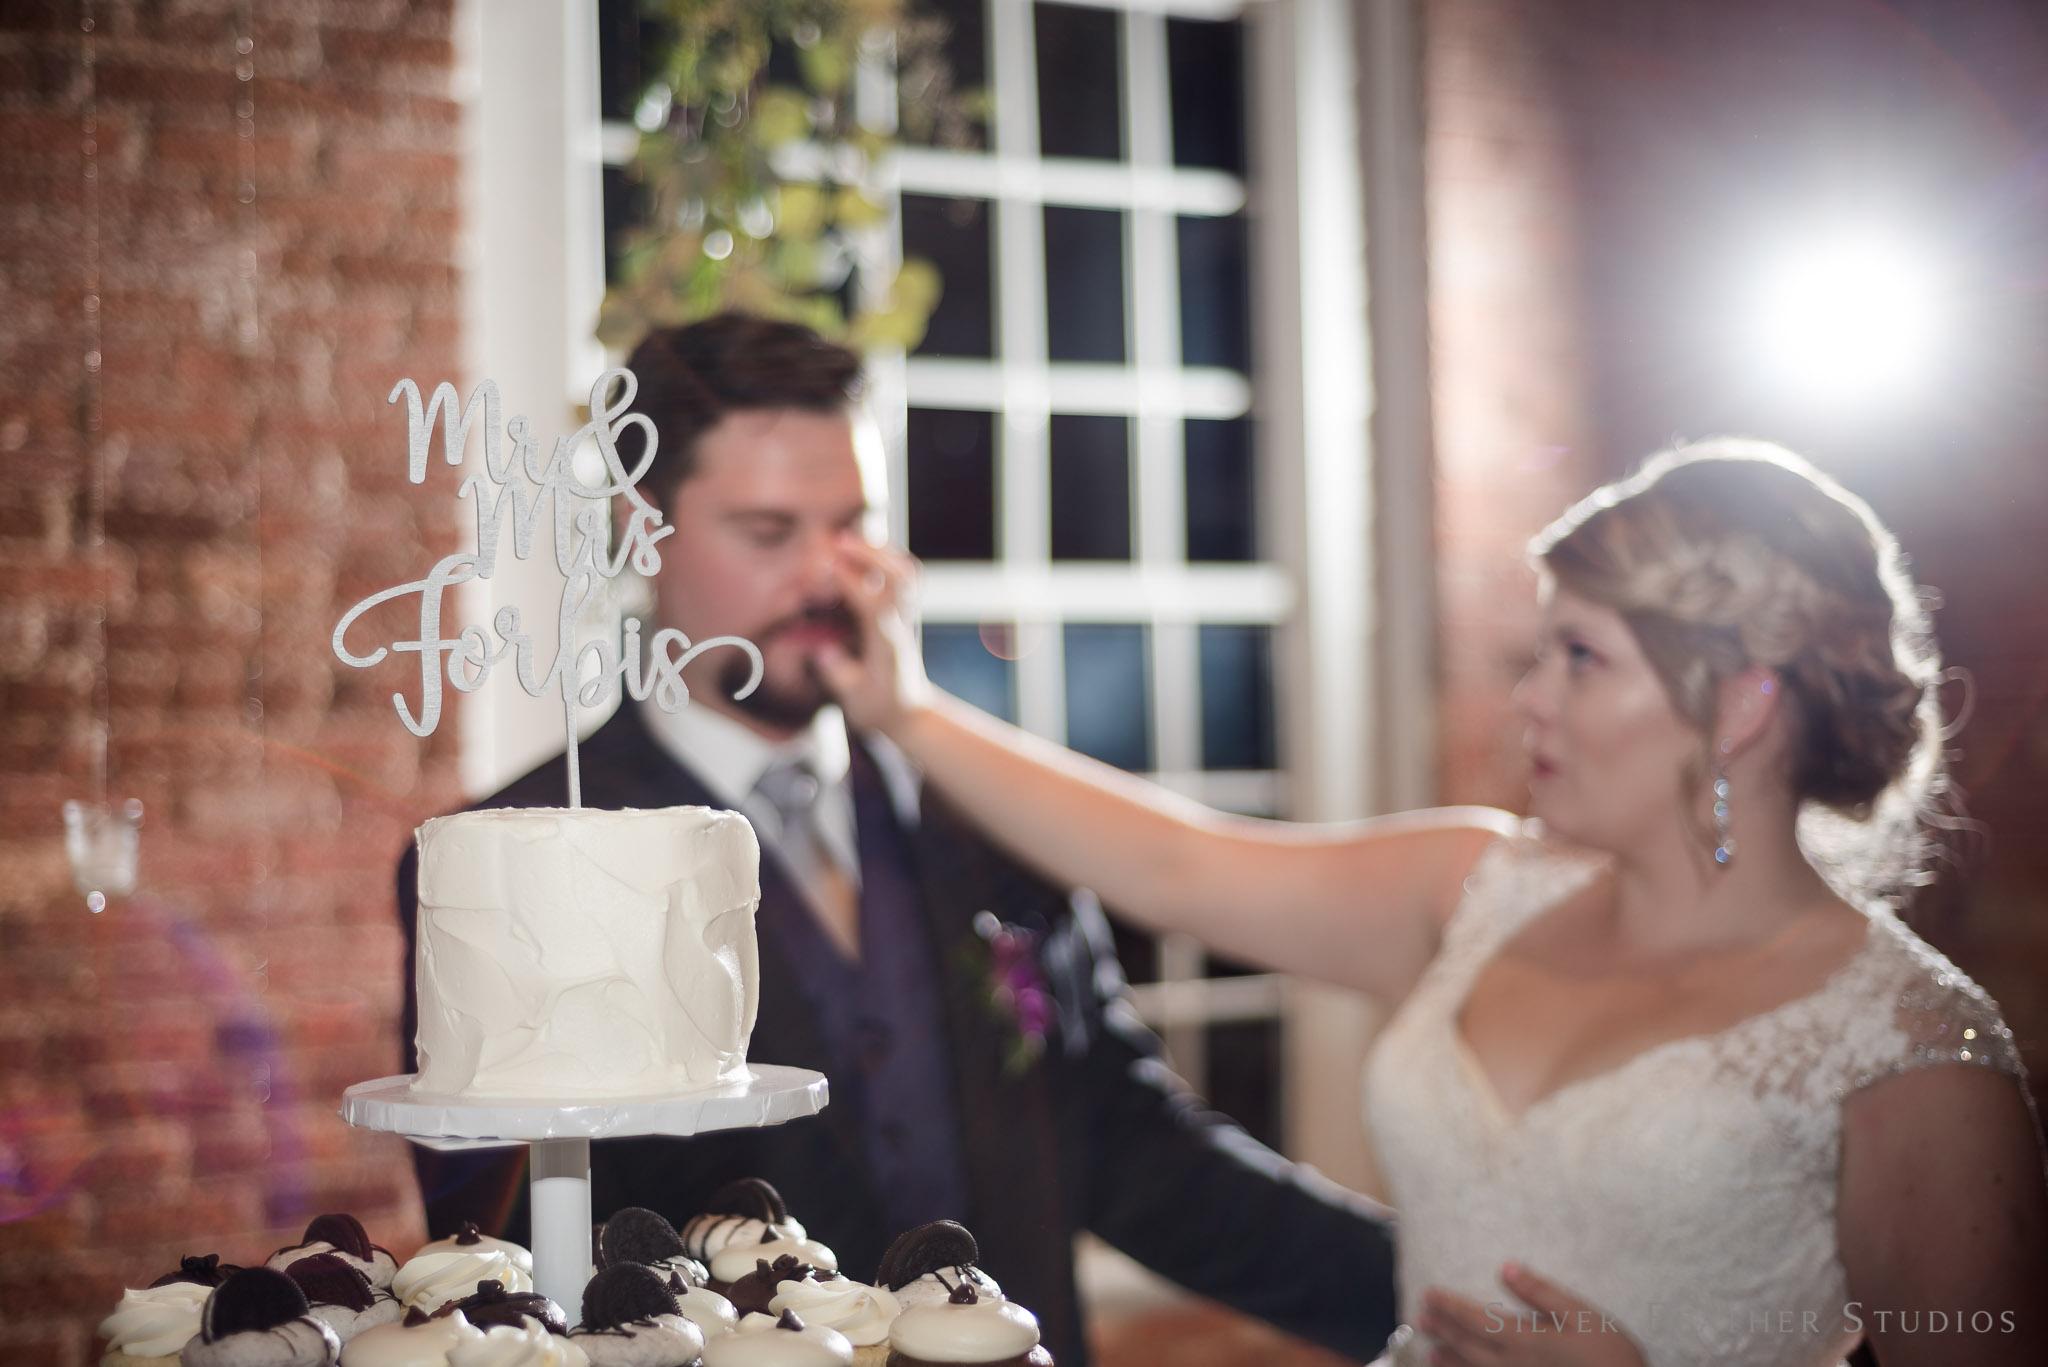 cottom-room-wedding-photography-044.jpg